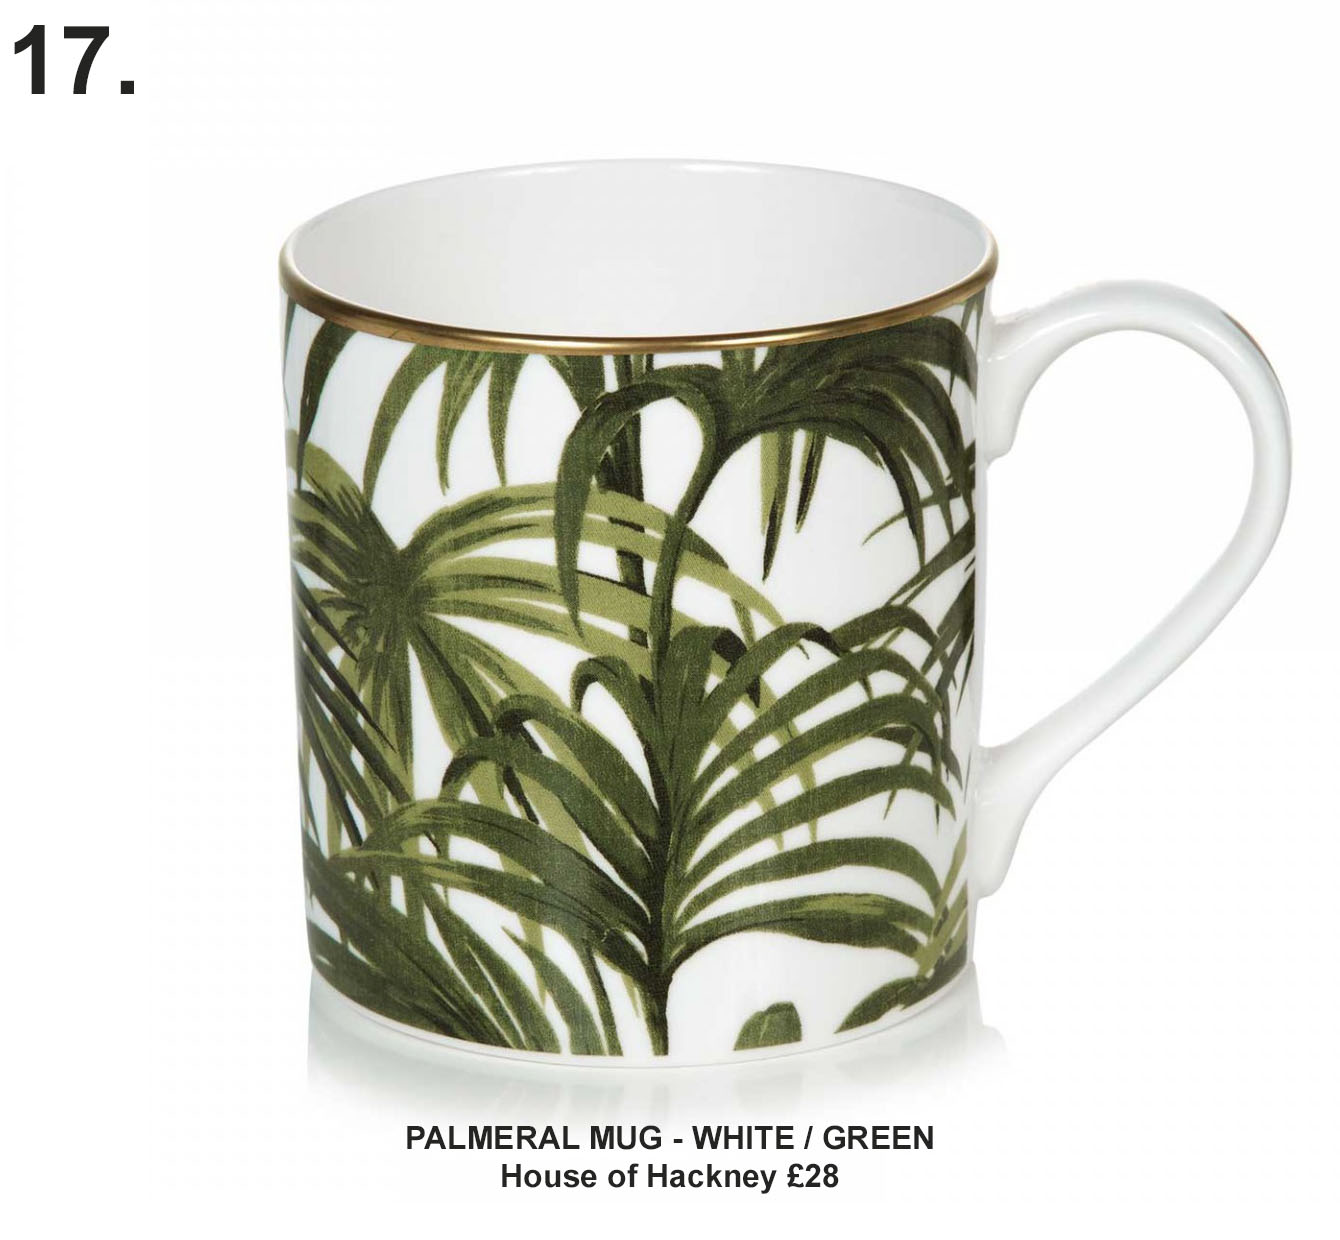 PALMERAL MUG - WHITE / GREEN, house of hackney £28